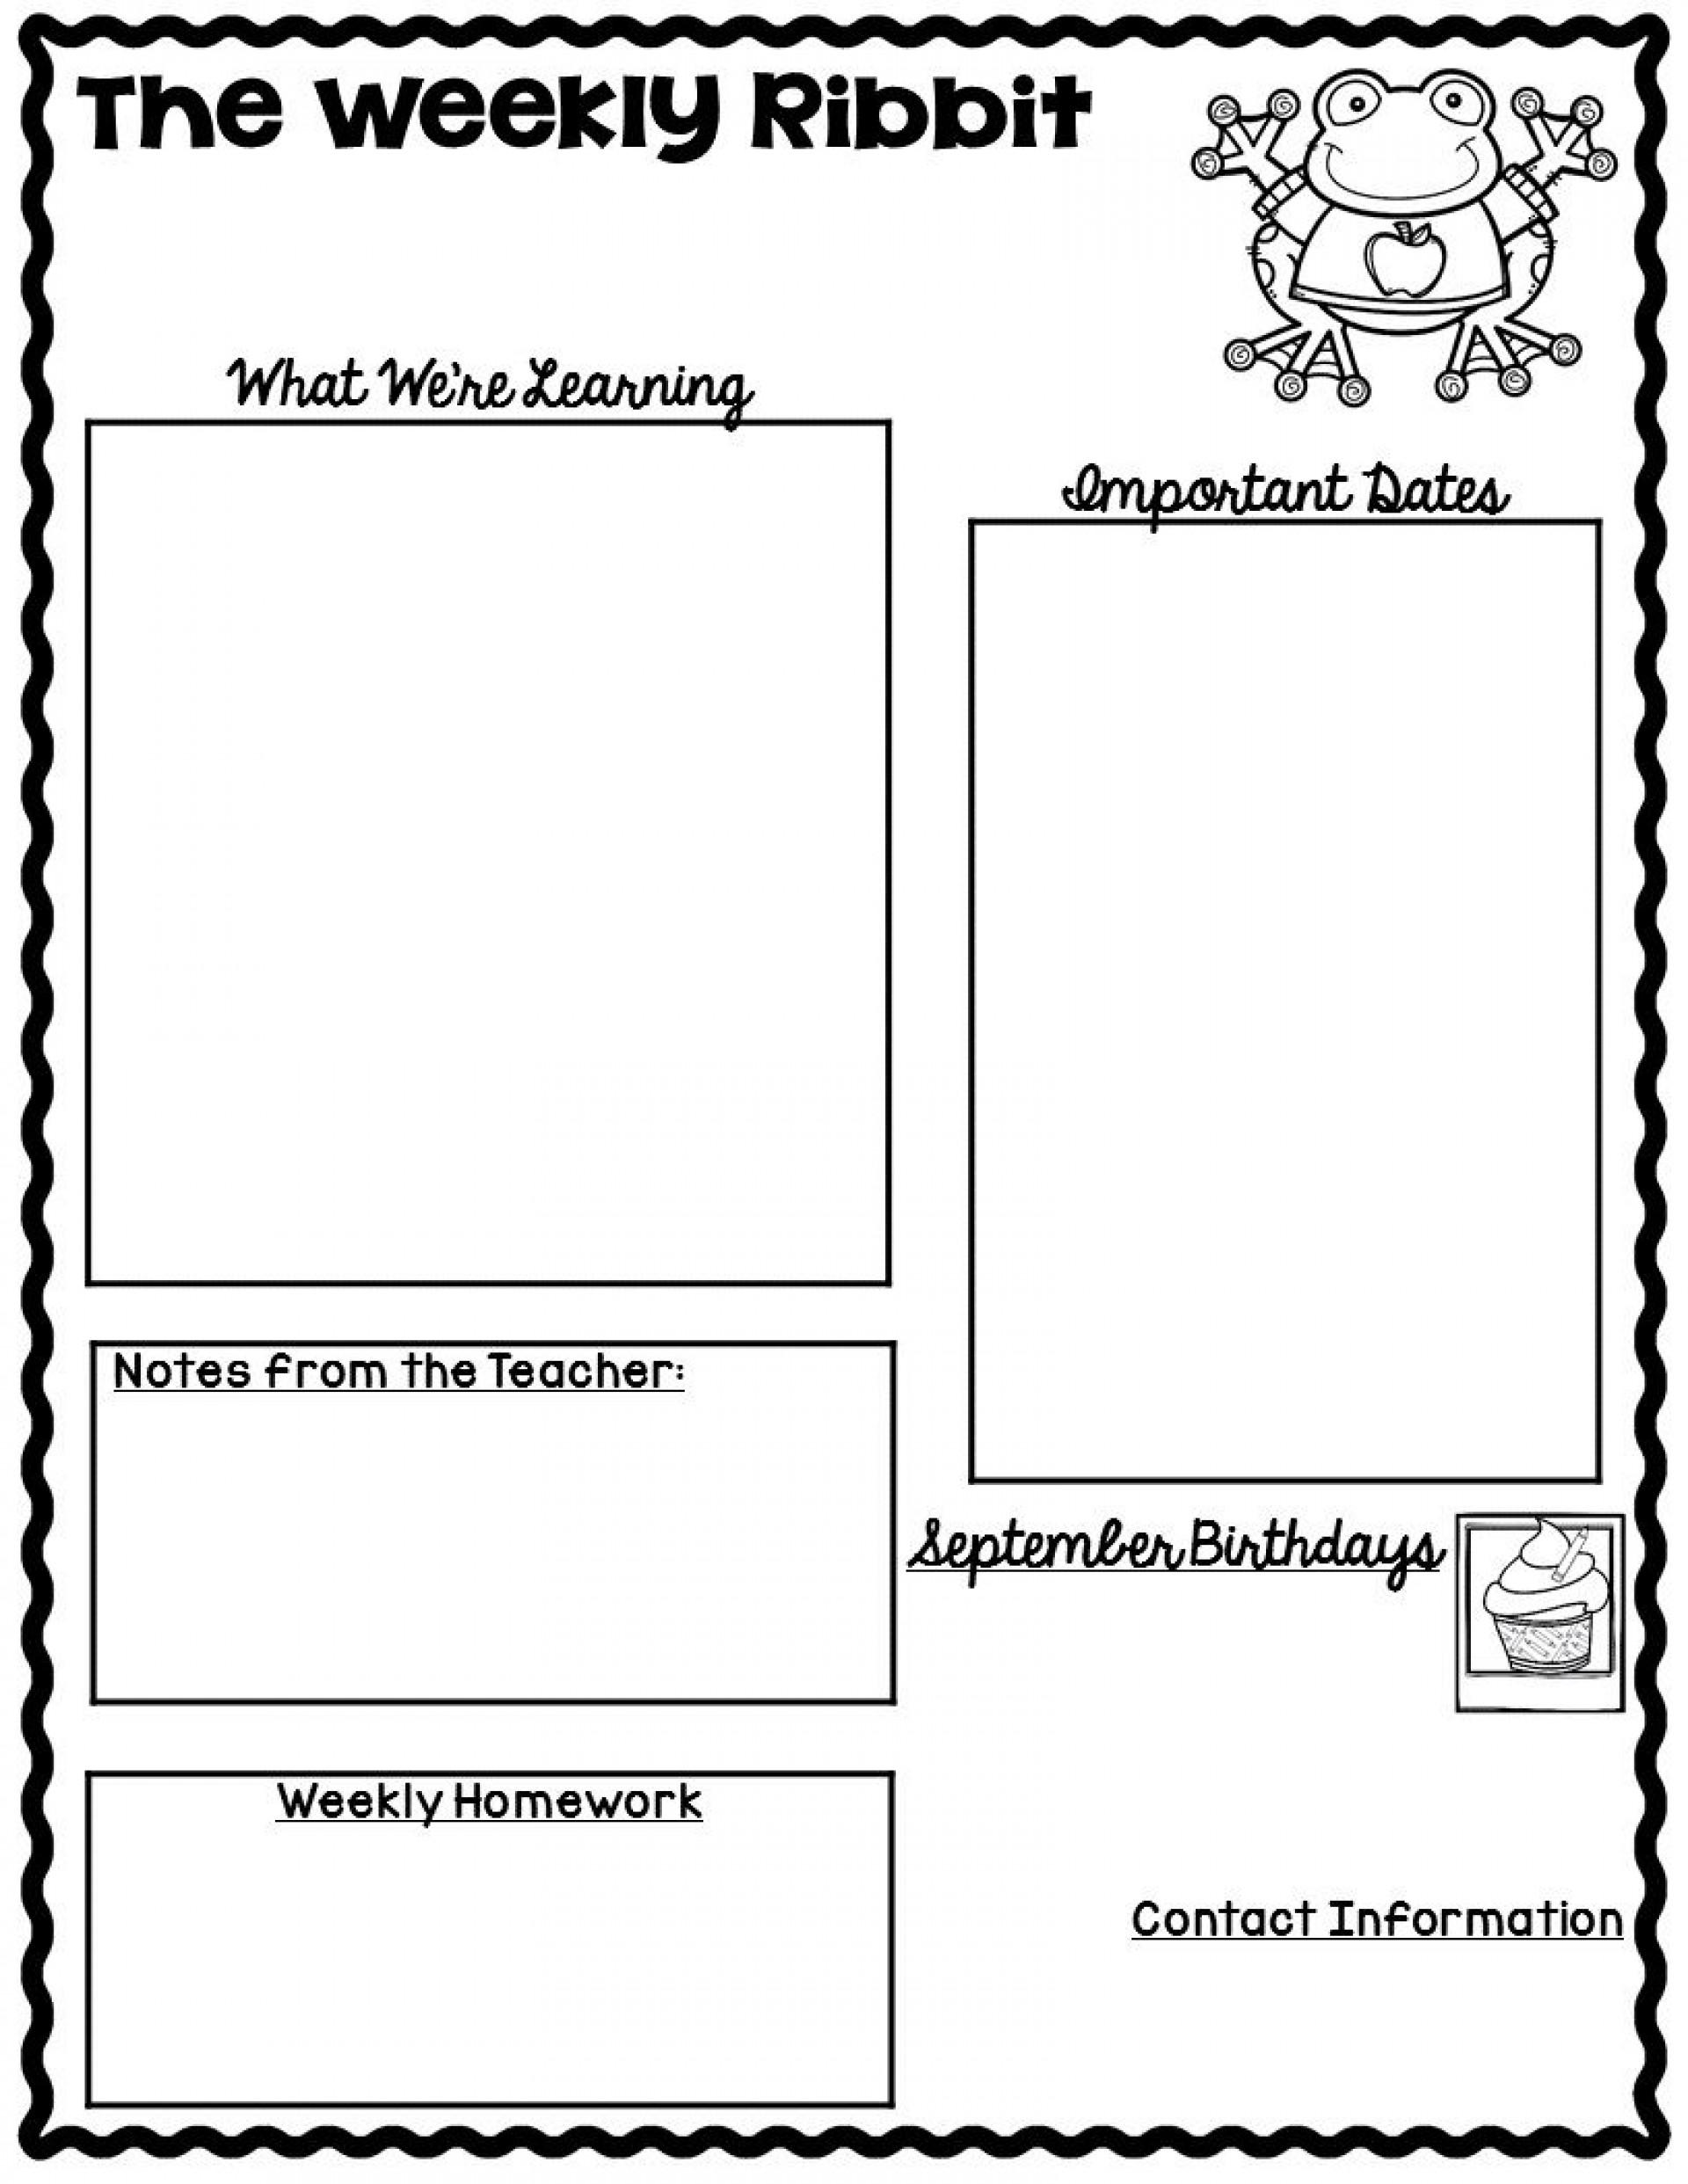 009 Top Newsletter Template For Teacher Highest Quality  Teachers To Parent Free Printable Digital1920